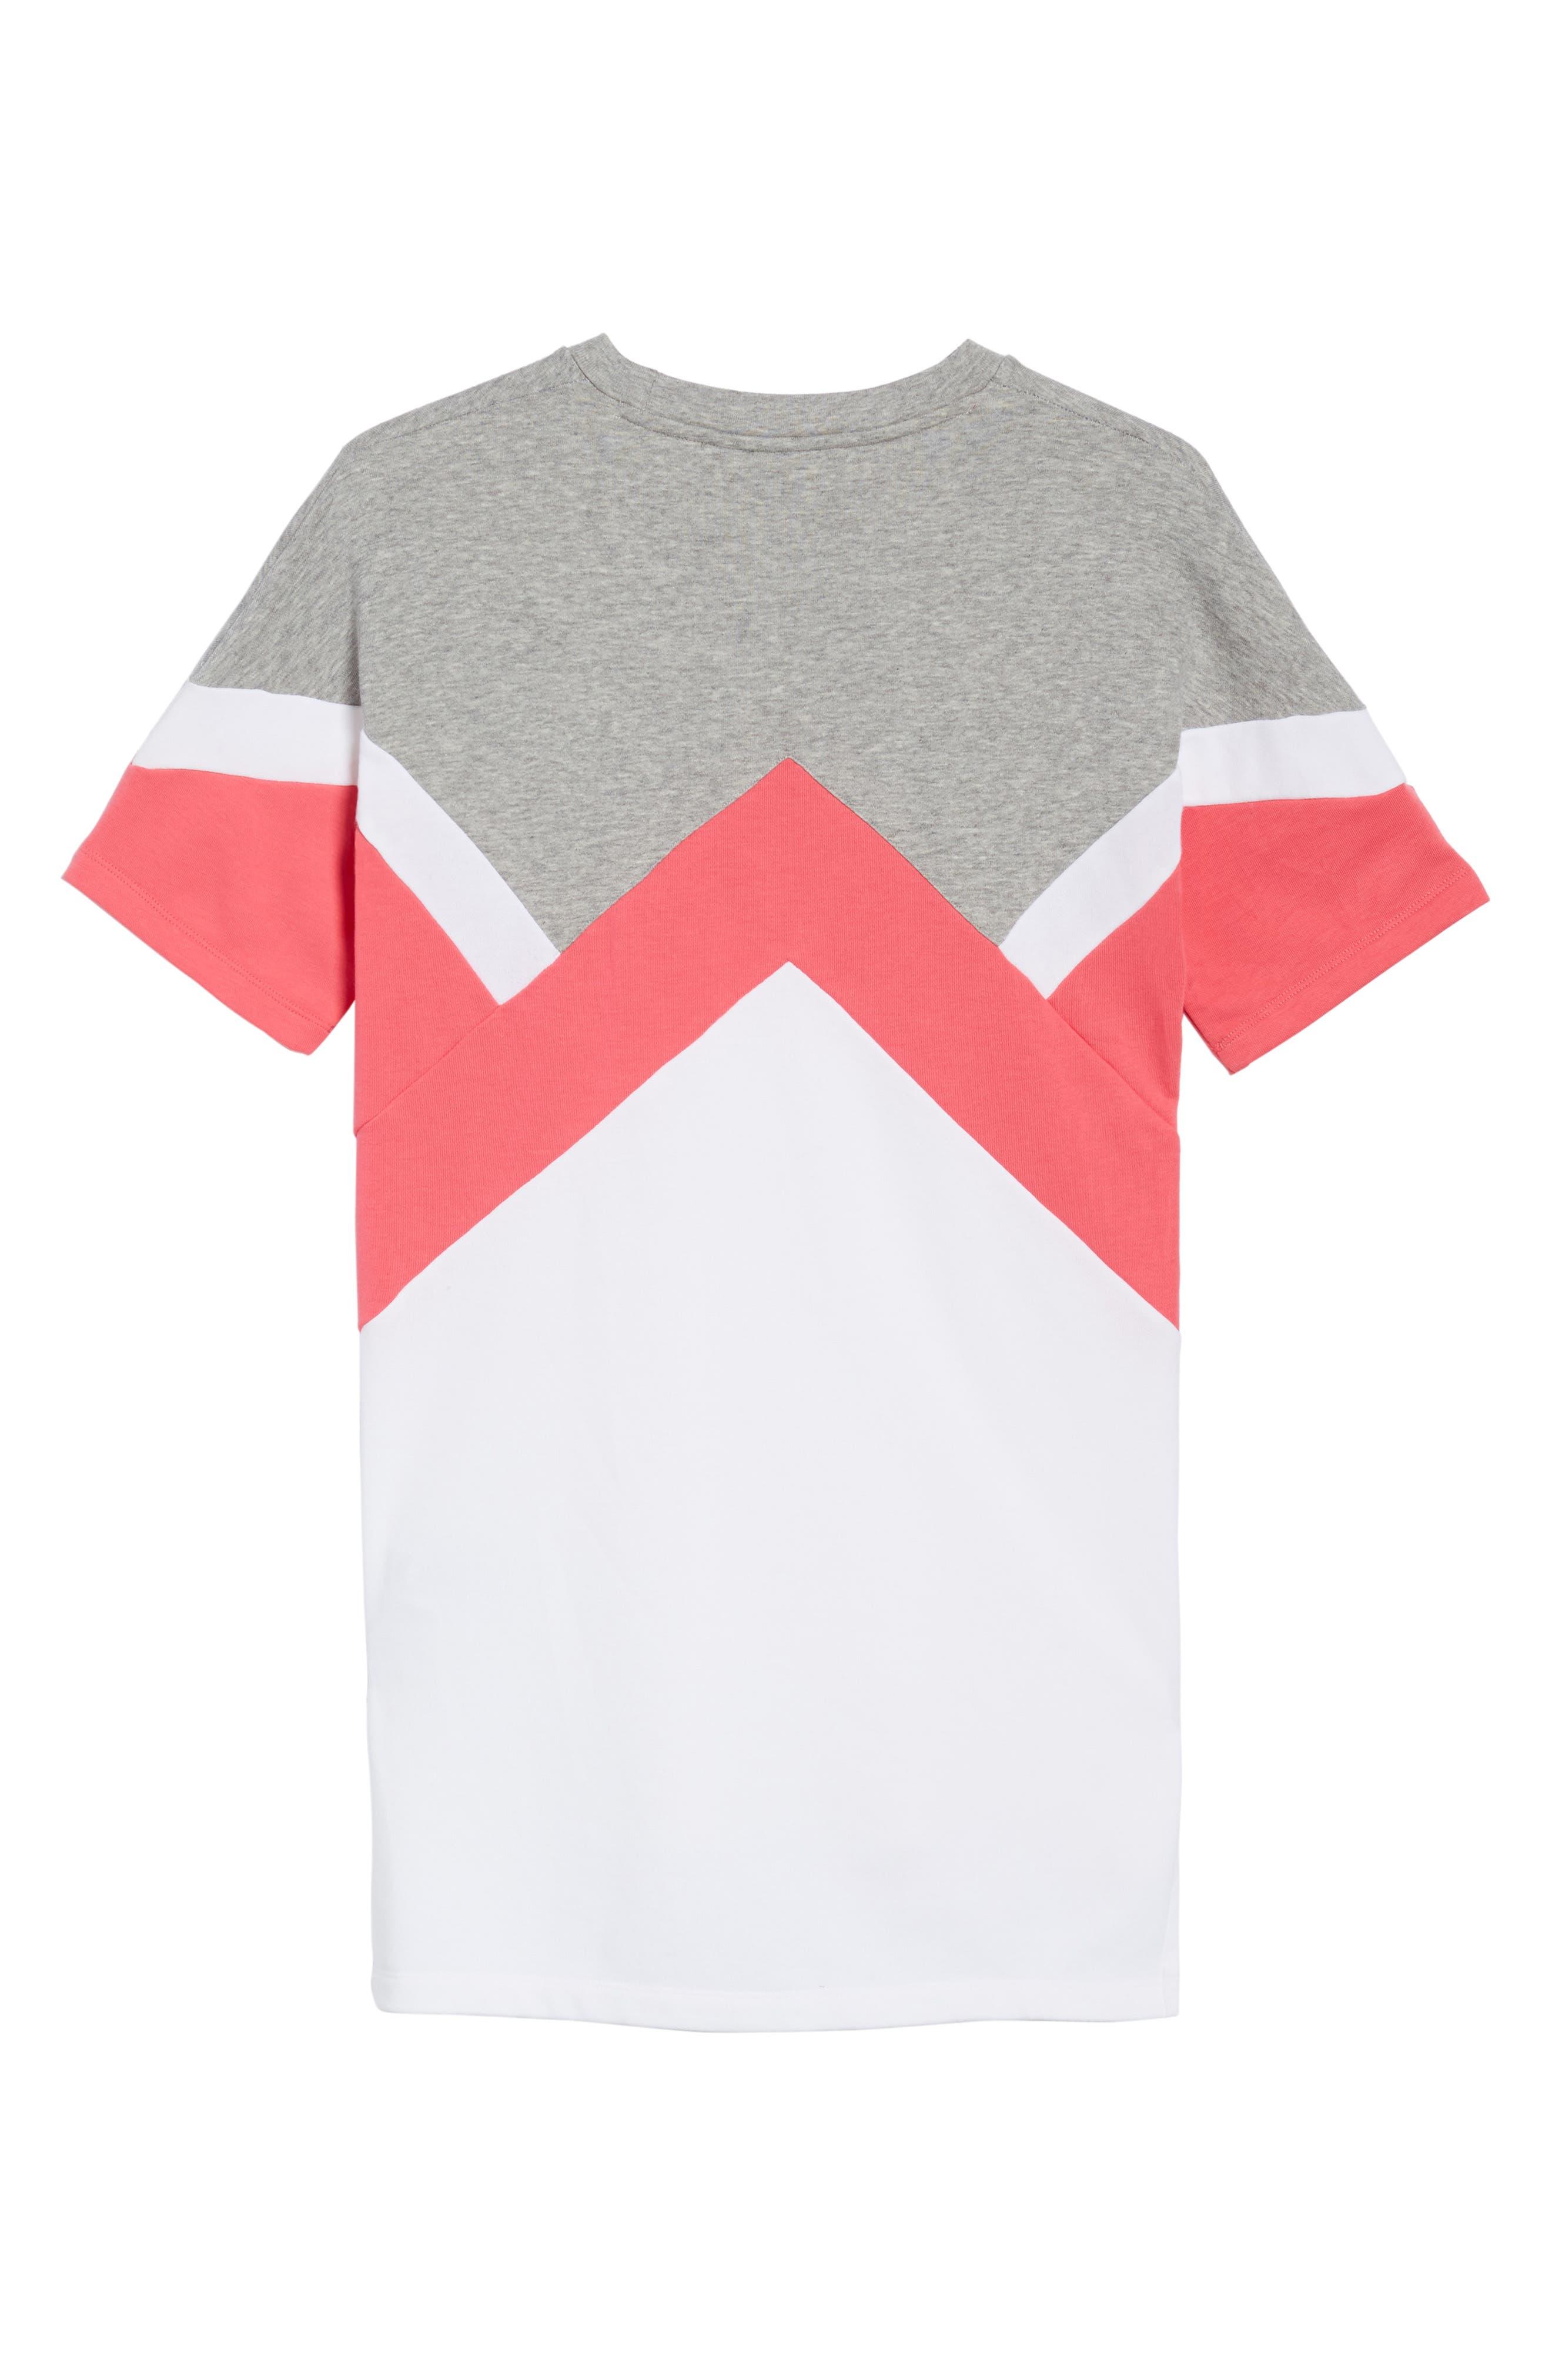 T-Shirt Dress,                             Alternate thumbnail 3, color,                             Grey / Pink/ White